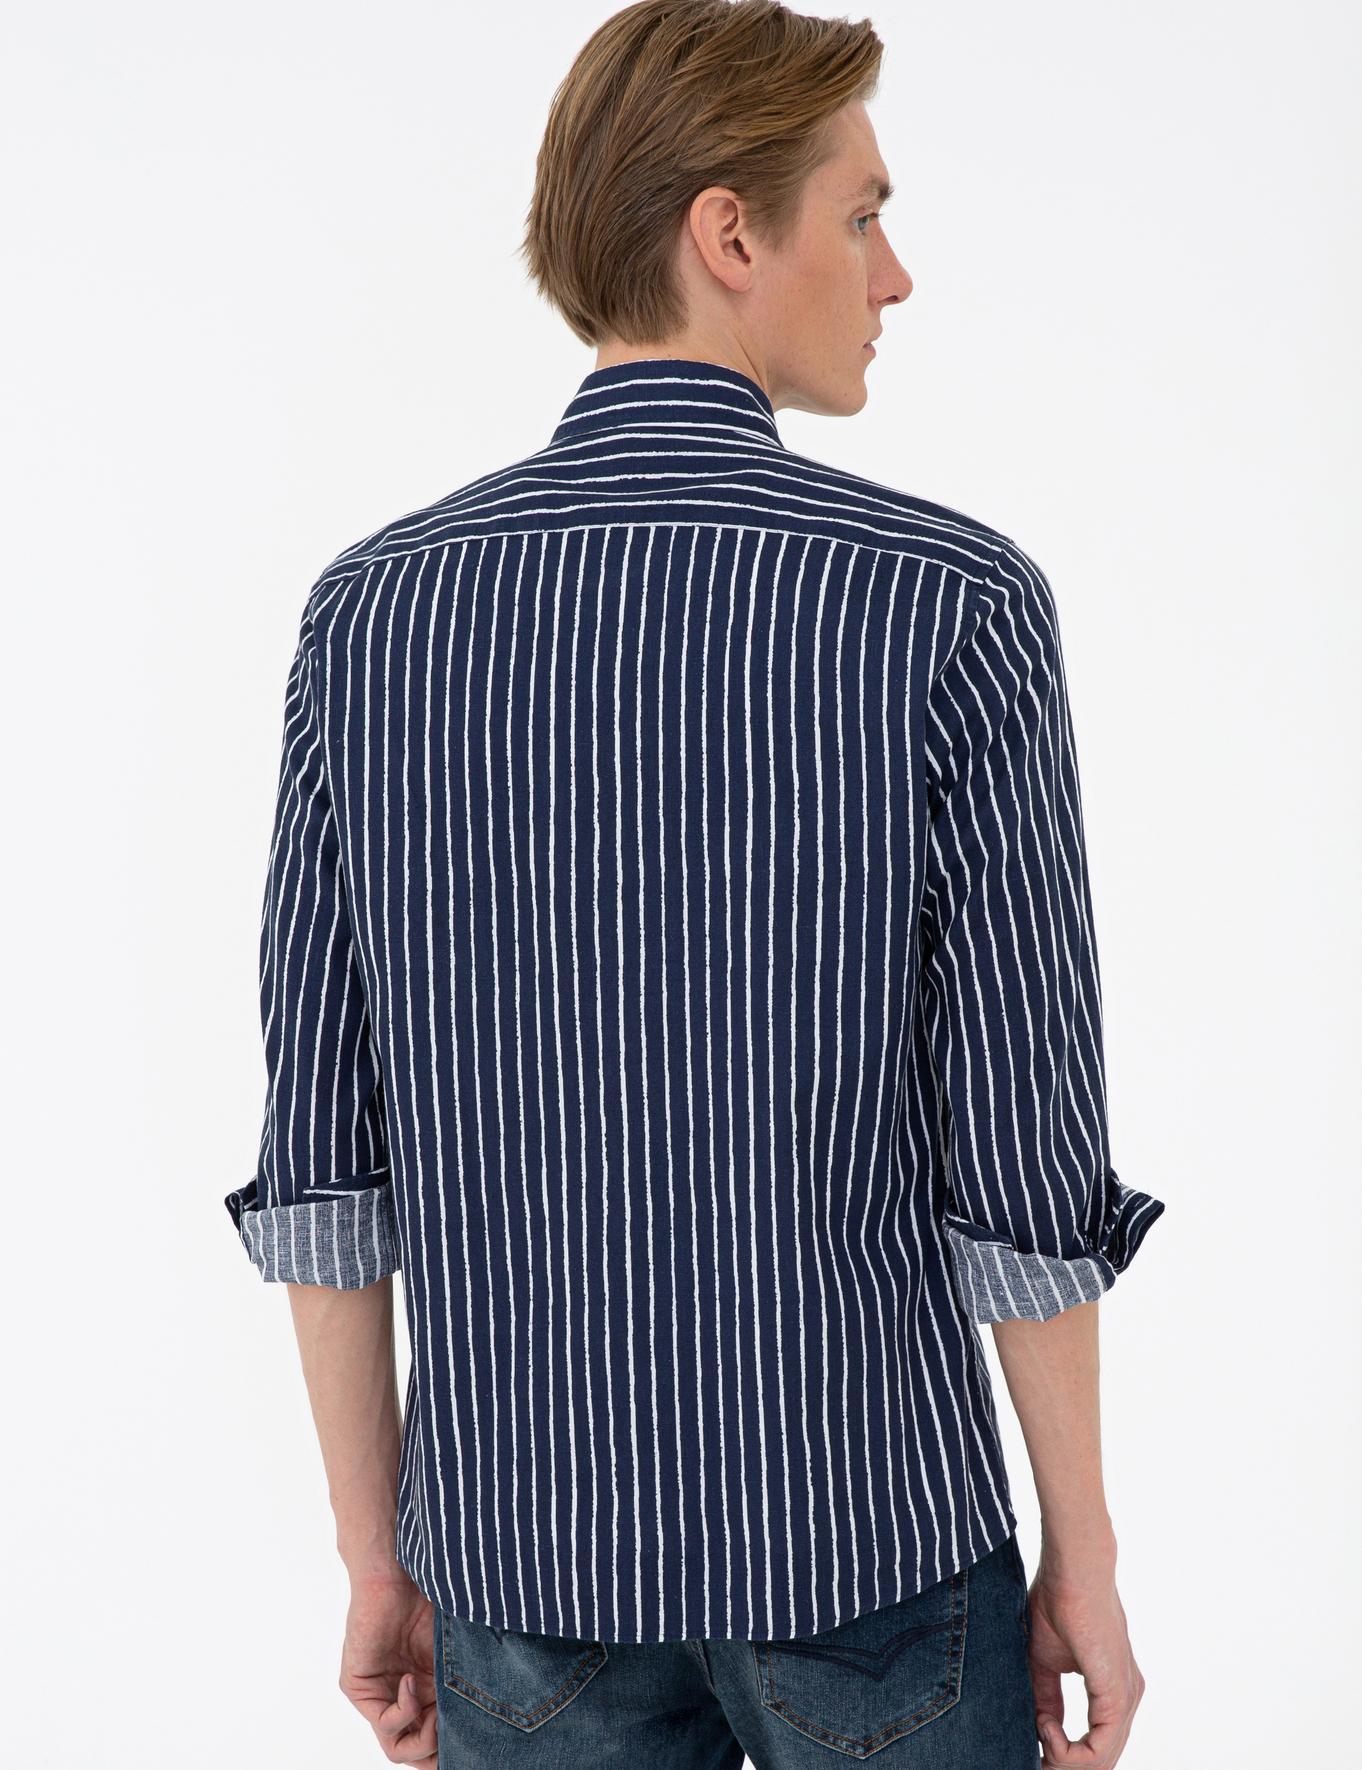 Lacivert Slim Fit Gömlek - 50233193005